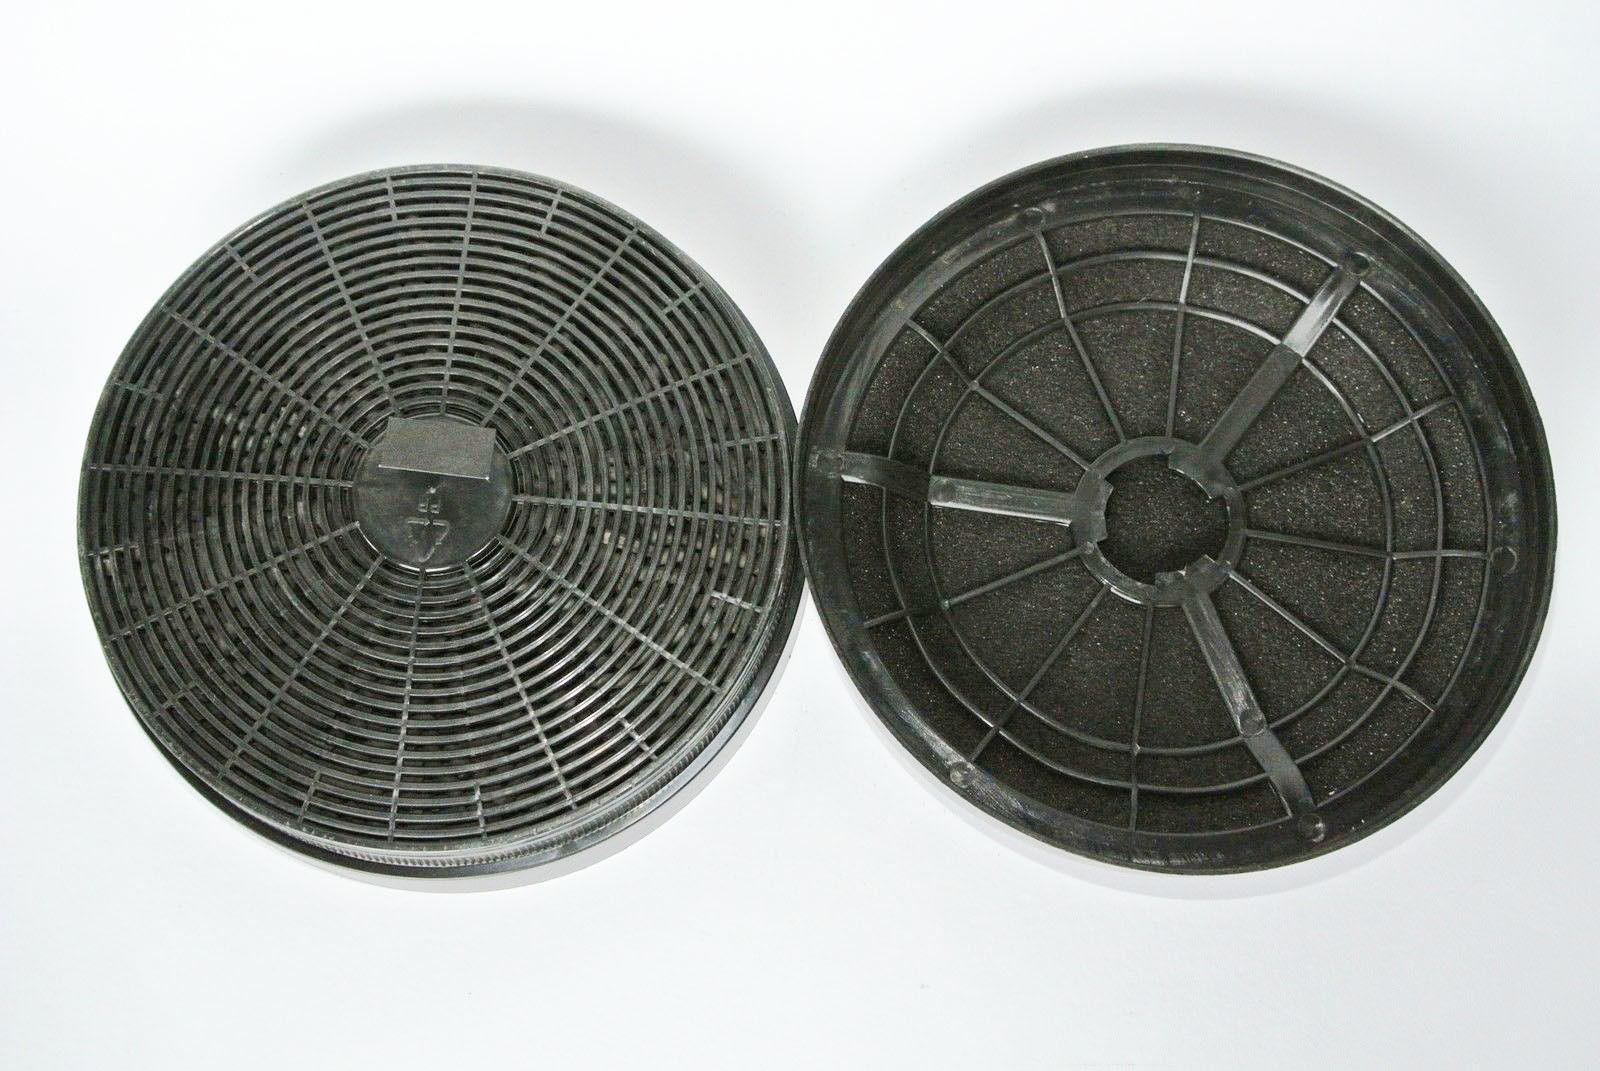 Paket umluftset dunstabzugshaube filter pkm isz inselhaube